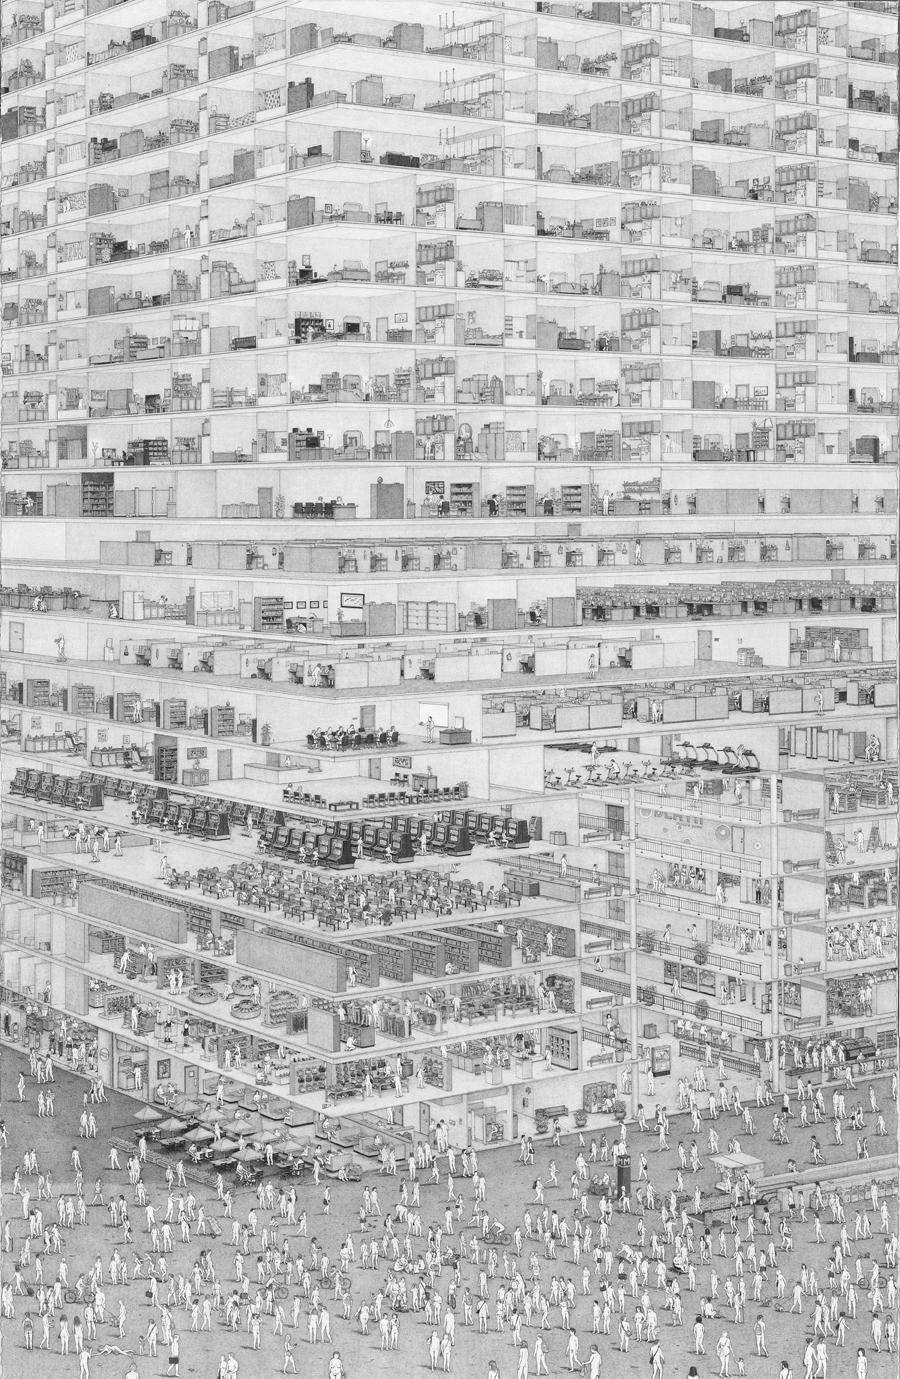 'Urban' - Ben Tolman